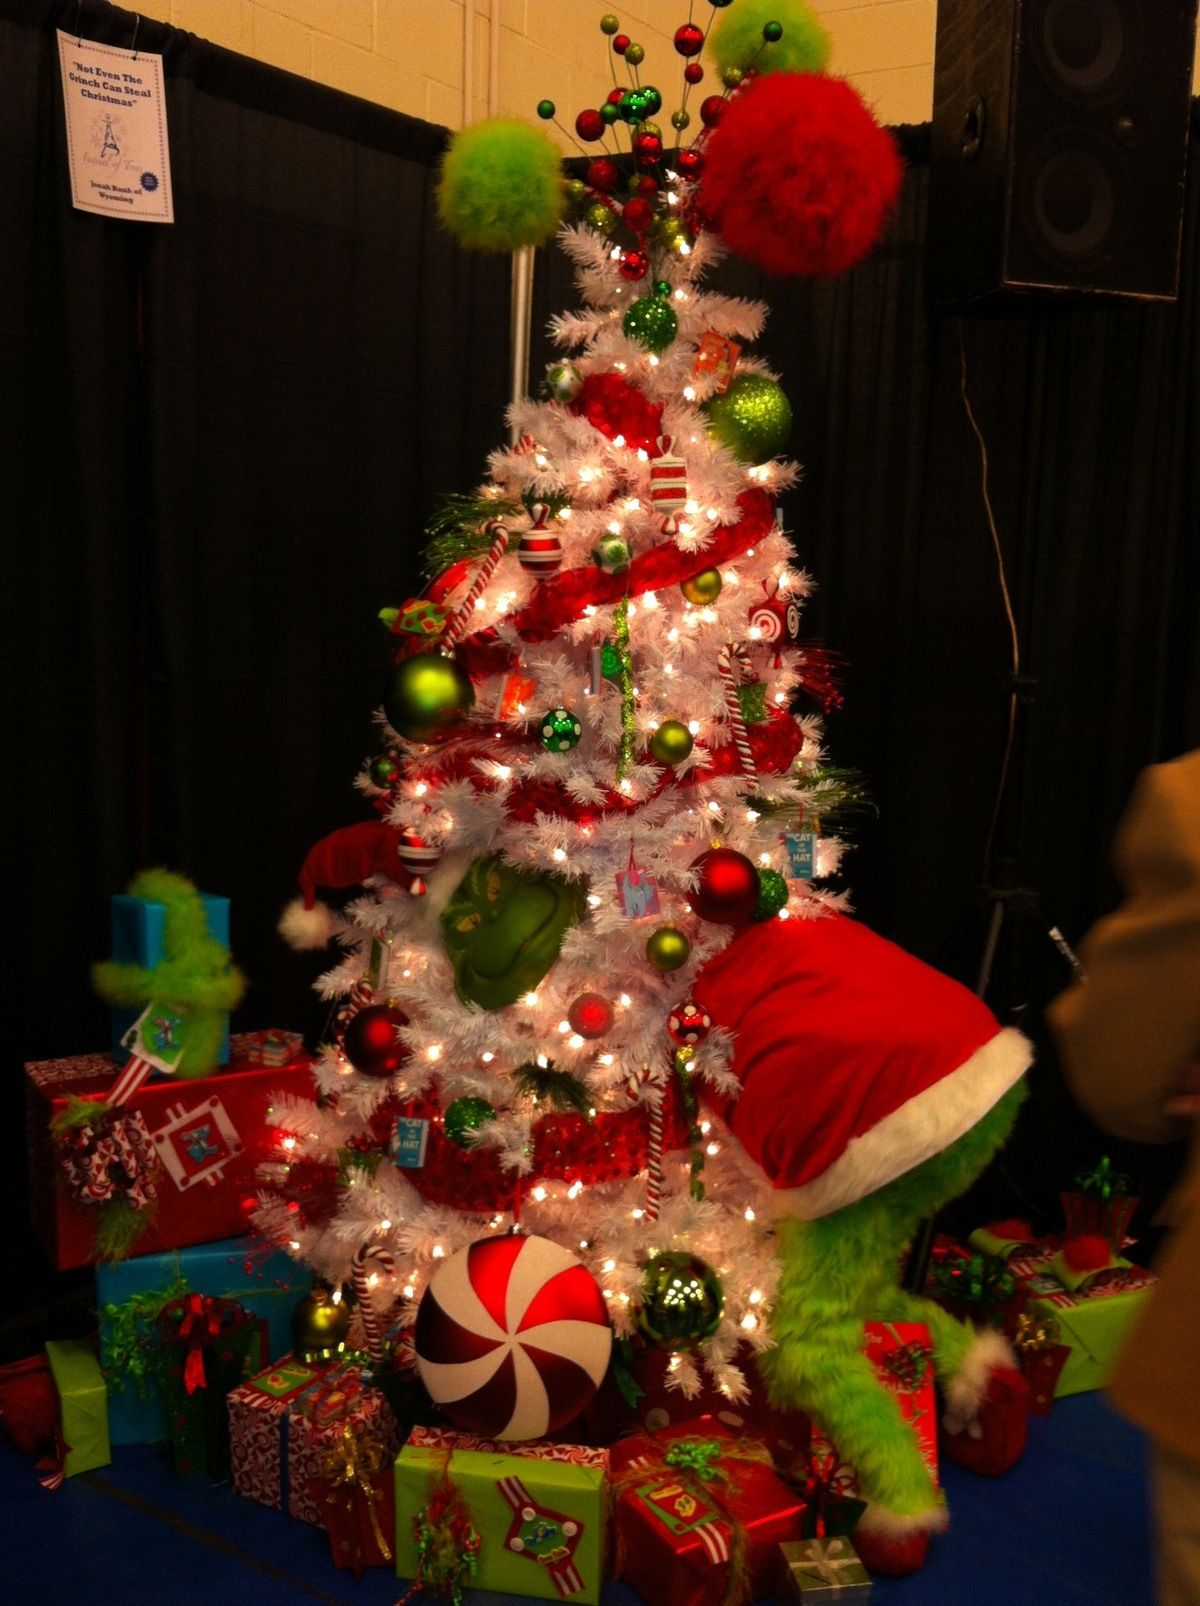 Christmas Decor Grinch : Grinch tree christmas